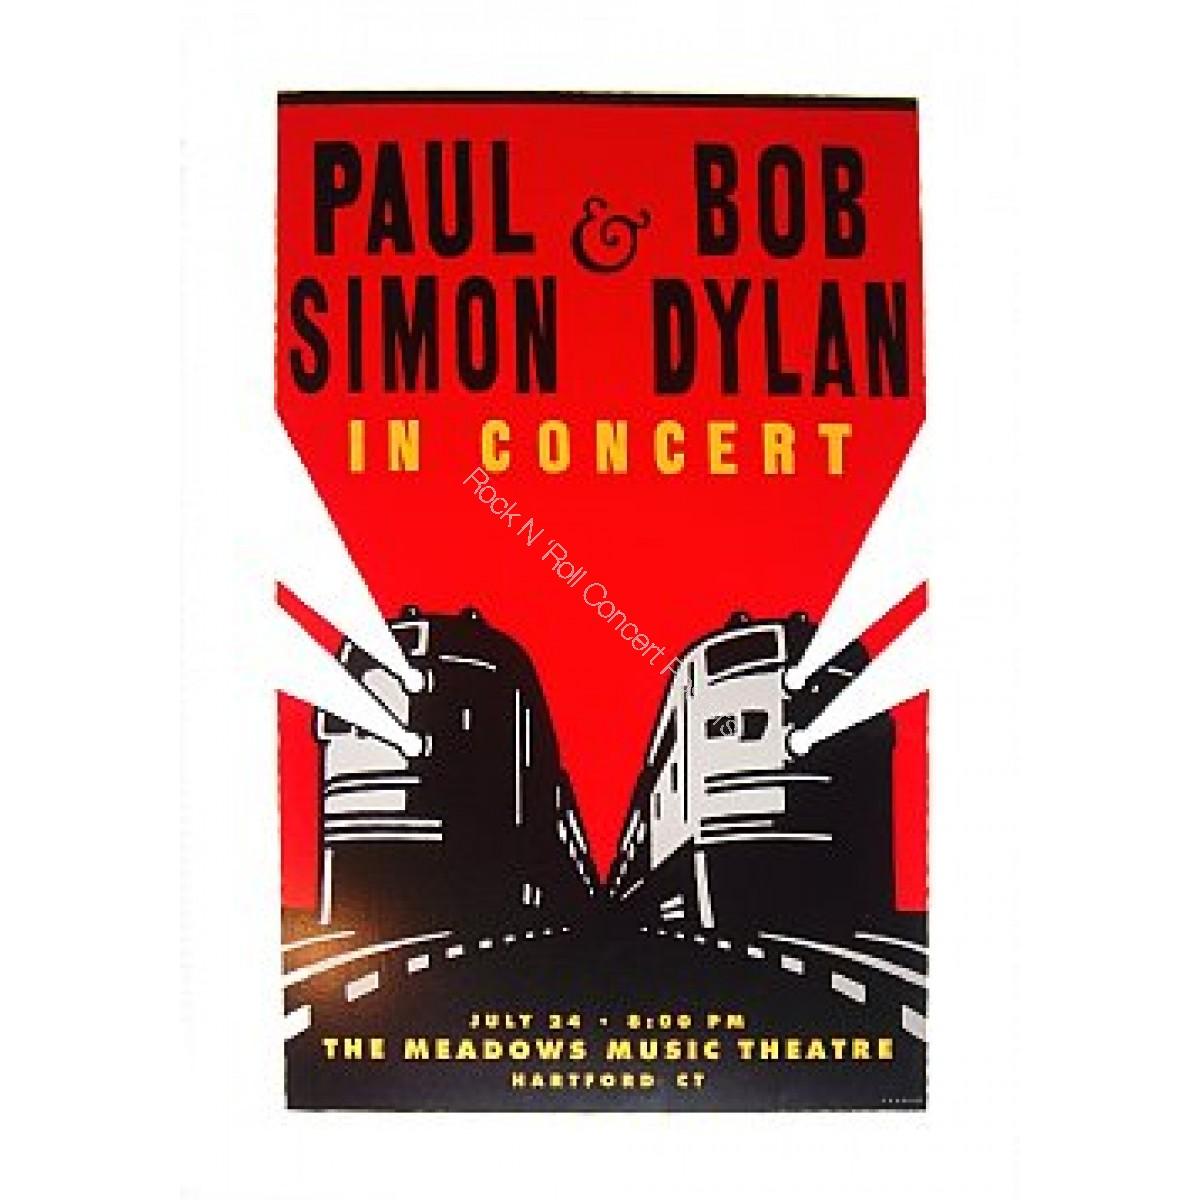 Bob Dylan & Paul Simon Meadows Music Theatre